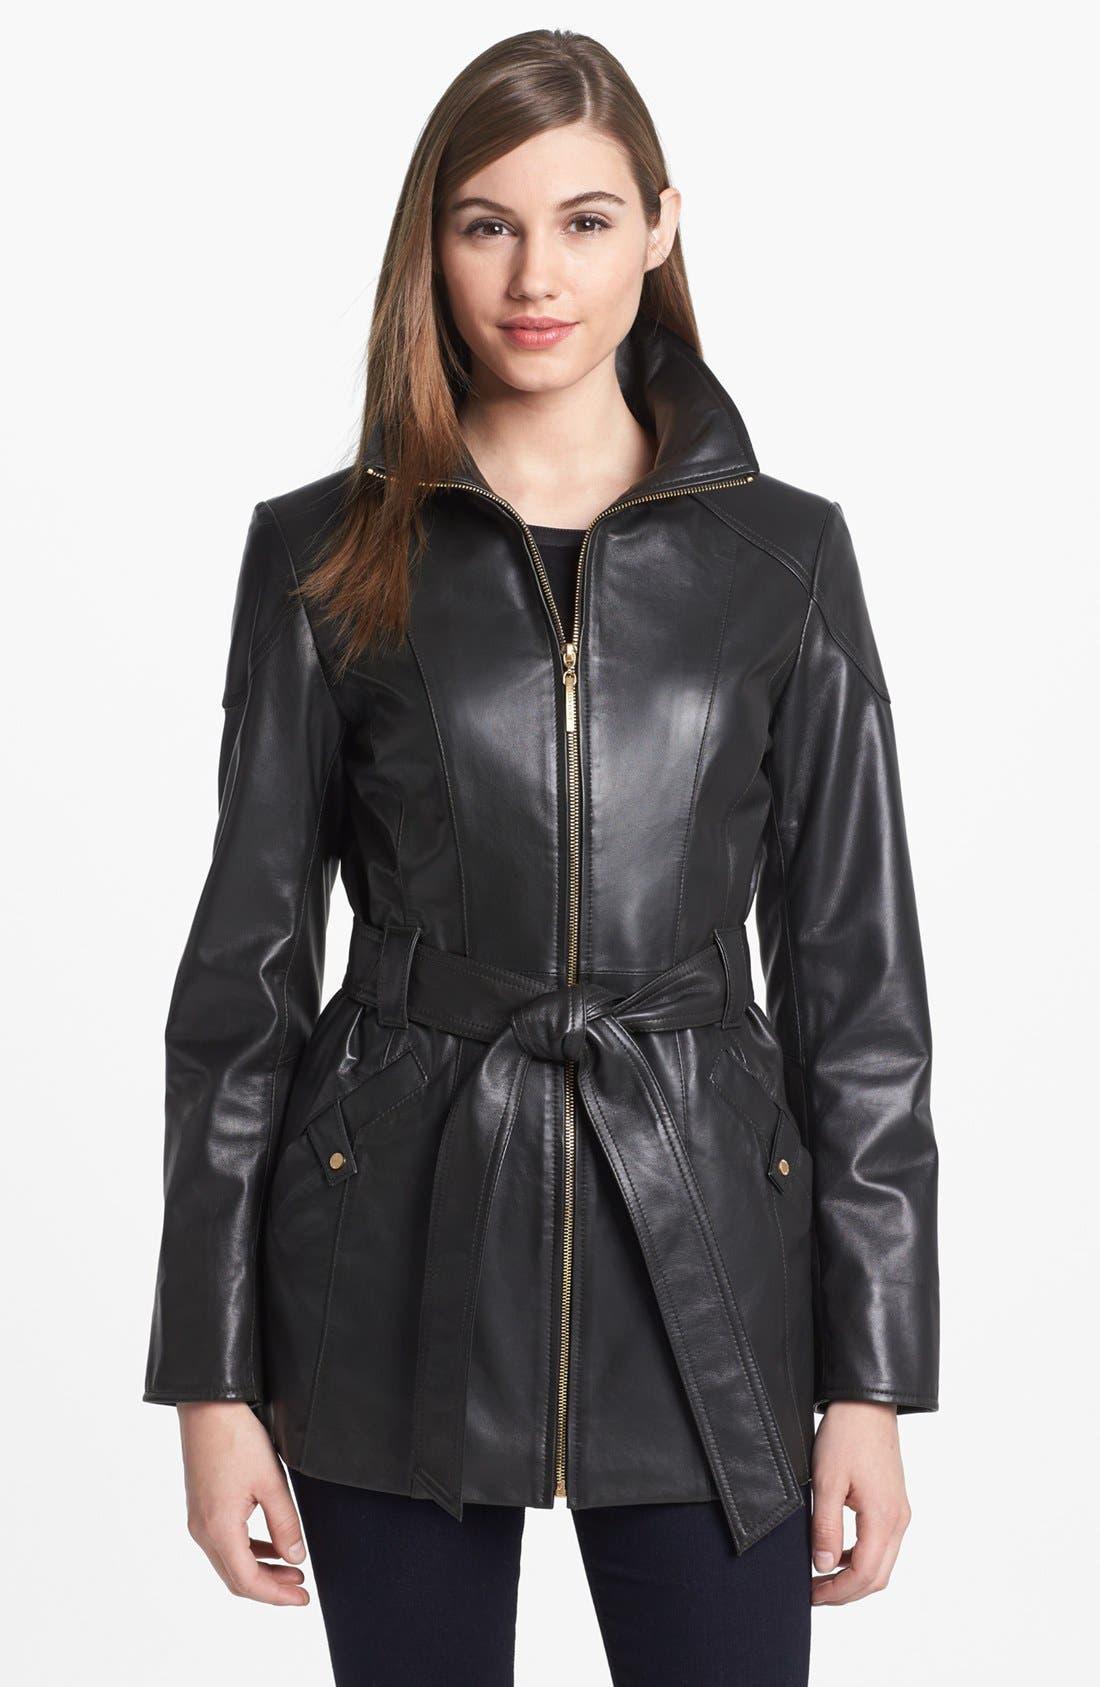 Alternate Image 1 Selected - Ellen Tracy Belted Leather Jacket (Nordstrom Exclusive)